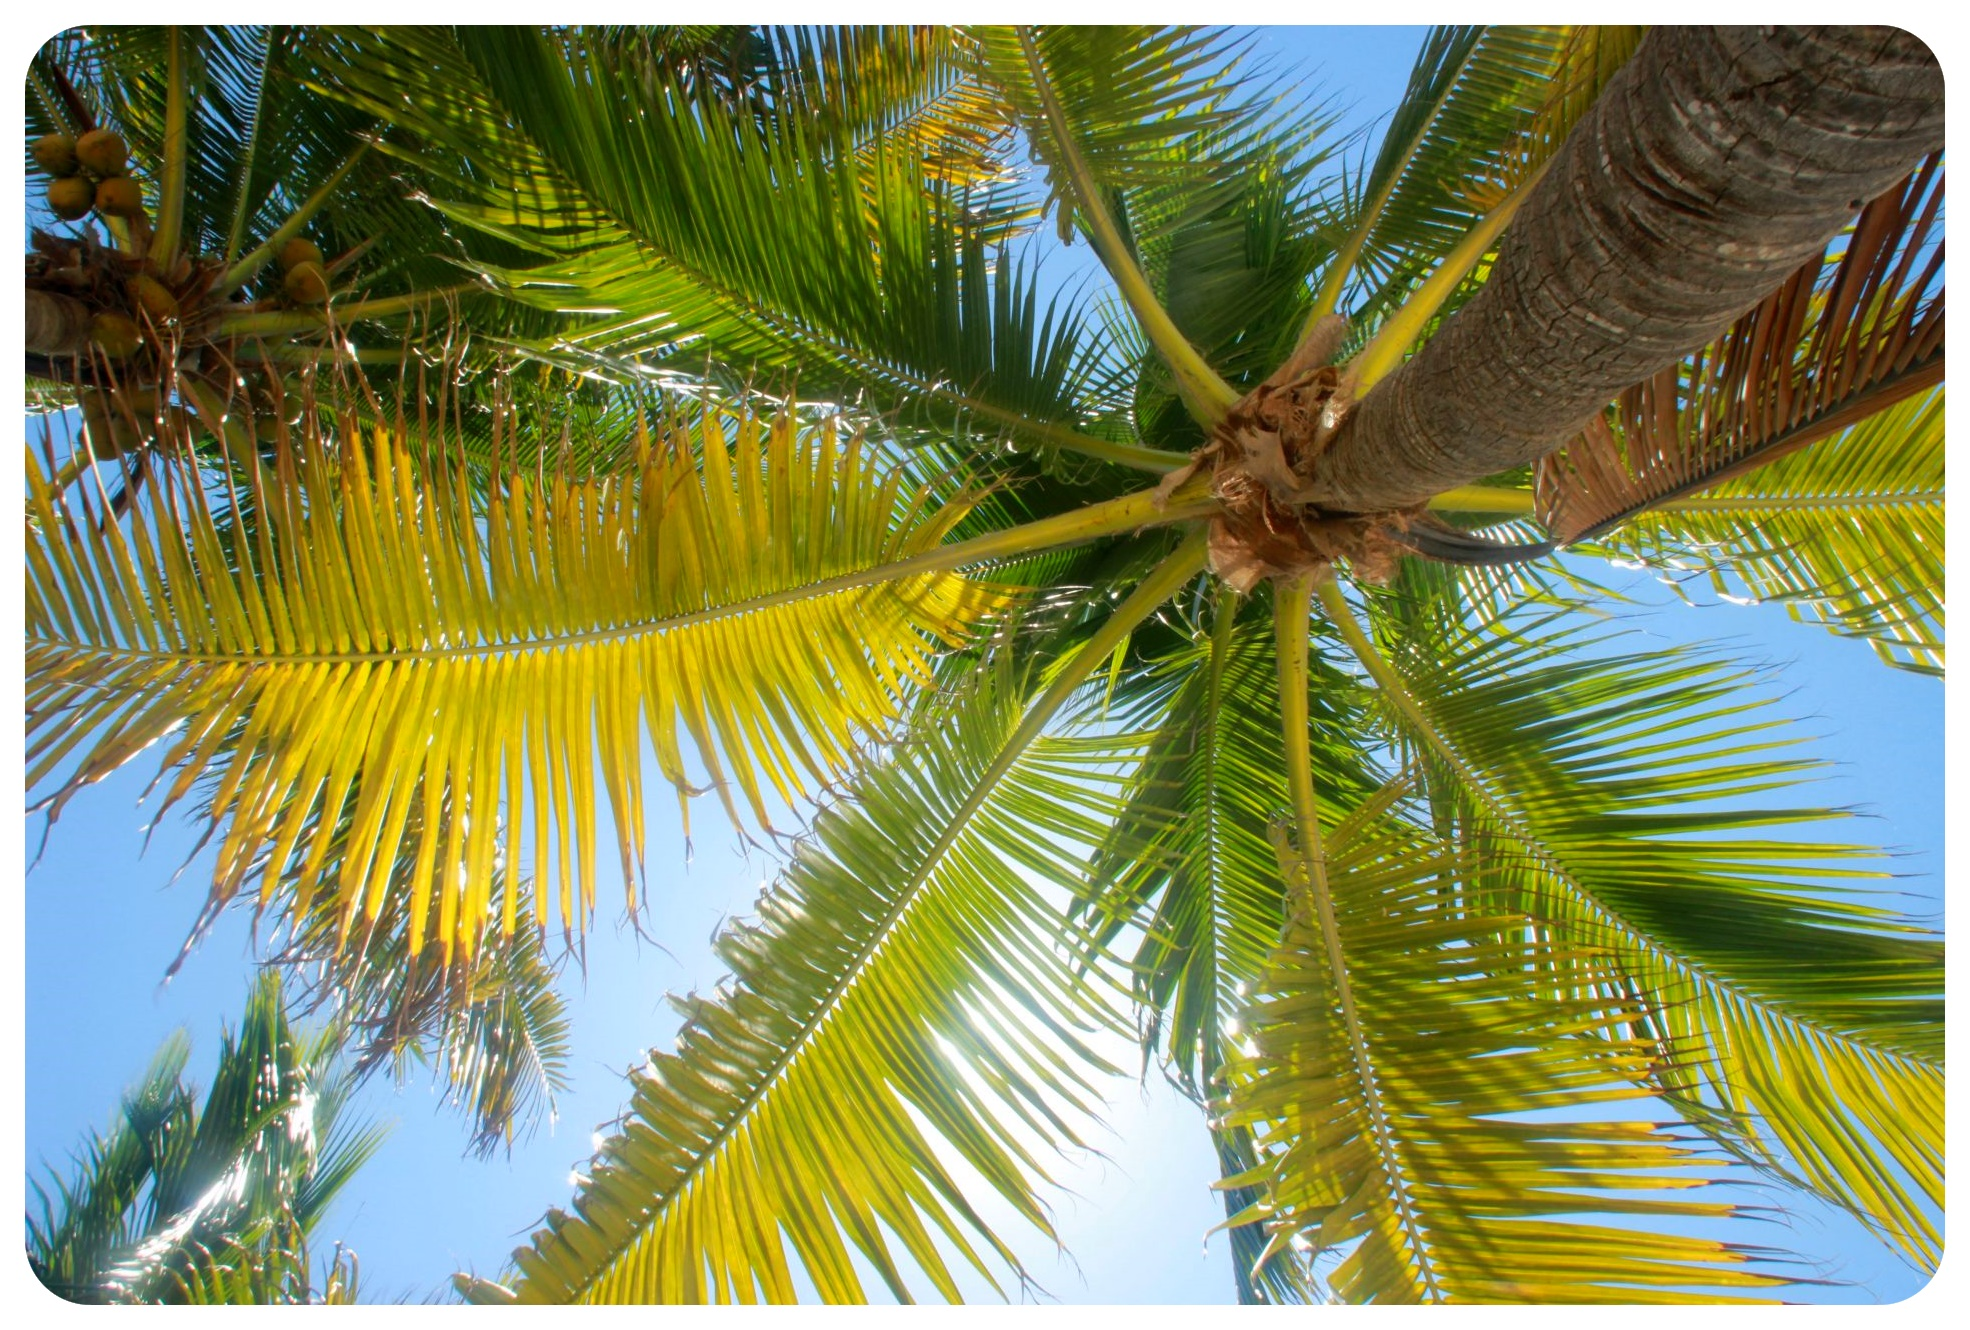 isla mujeres palm trees